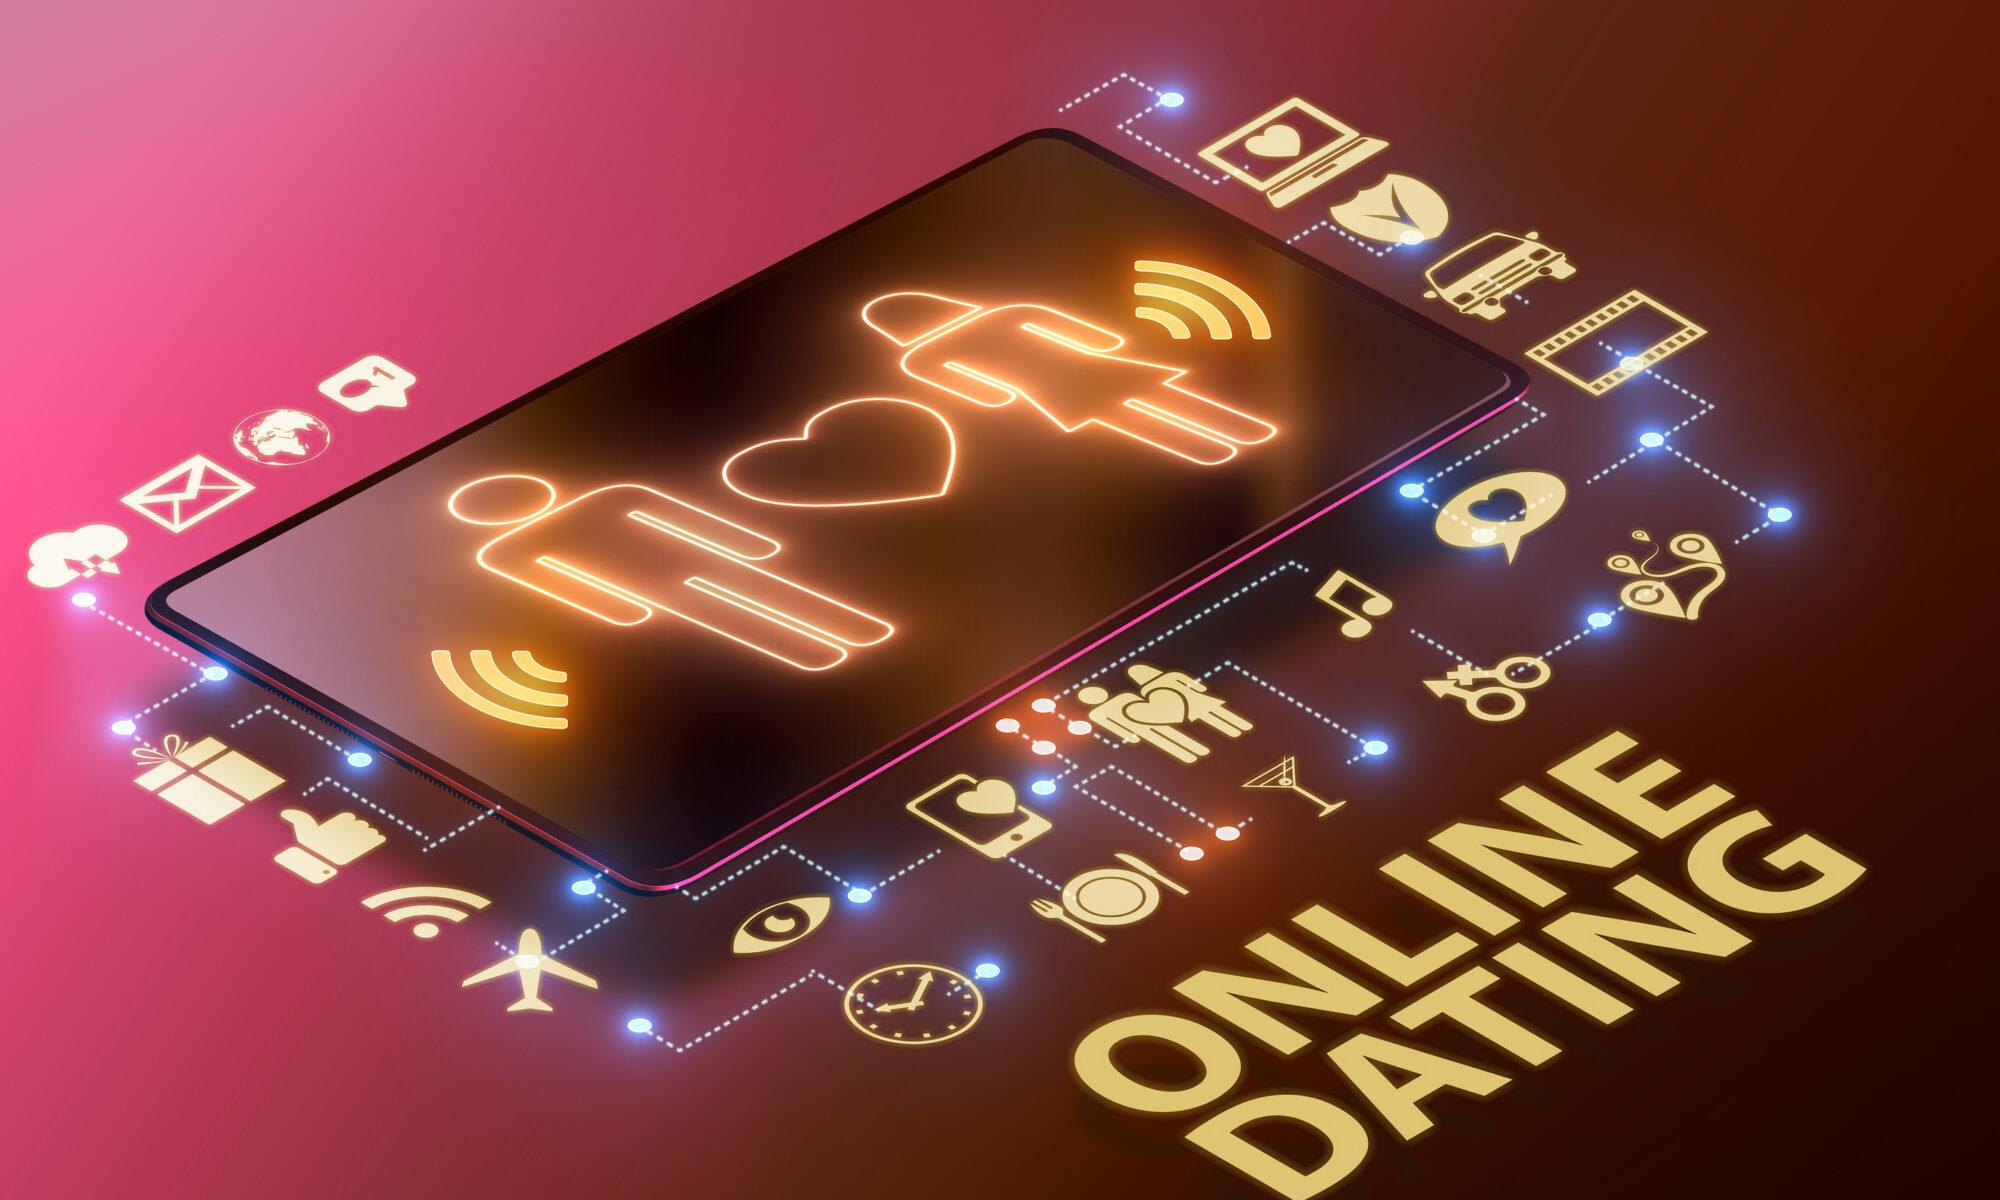 Singlebörse online Dating auf dem Tablet